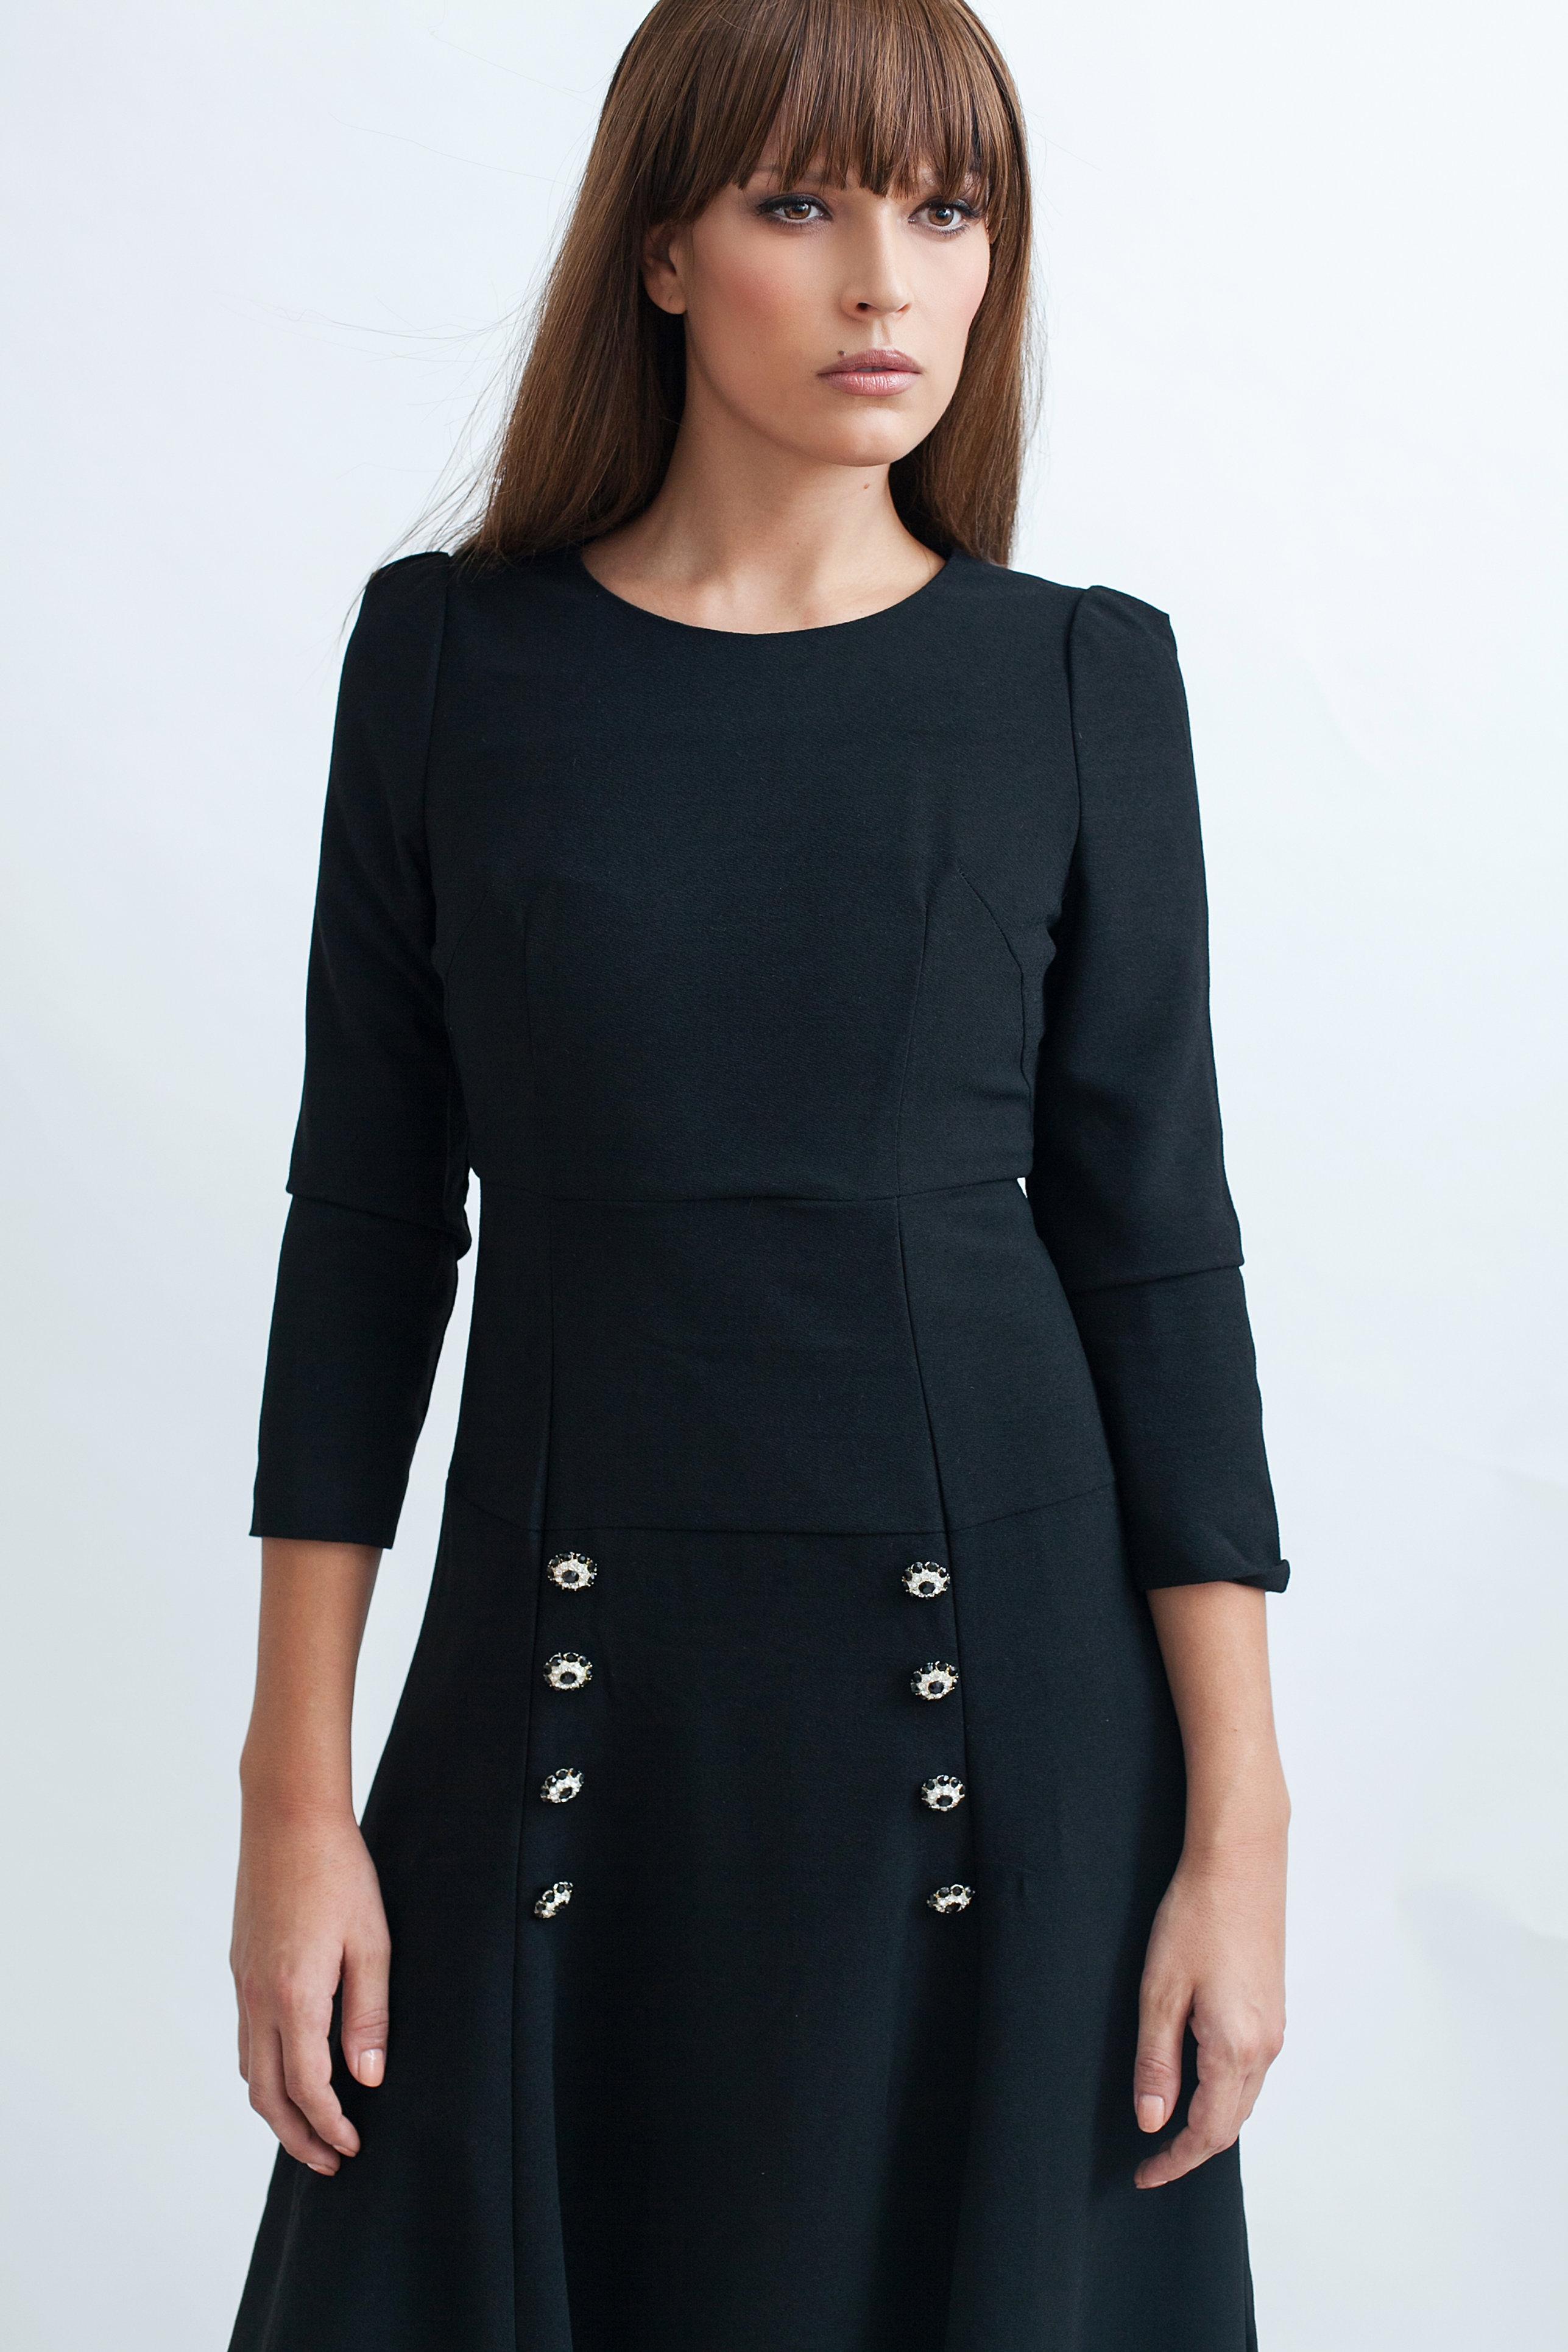 Black dress under knee - Below The Knee Dress With Button Decor